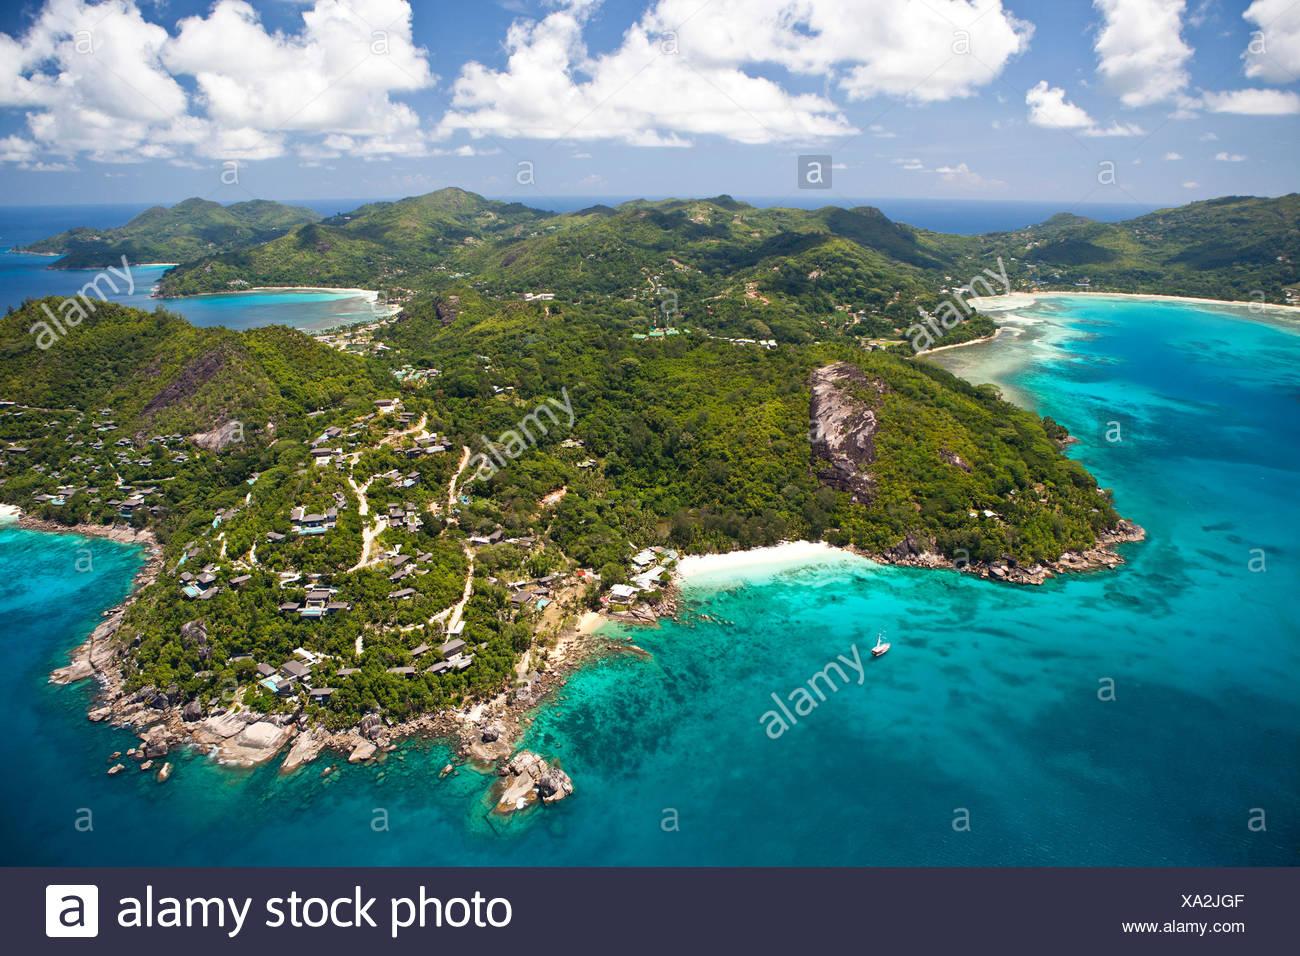 Anse á la Mouche, Anse Soleil, Roche Soleil, Mte. Toupie and Baie Lazare, Southern Mahe, Mahe Island, Seychelles, Africa - Stock Image